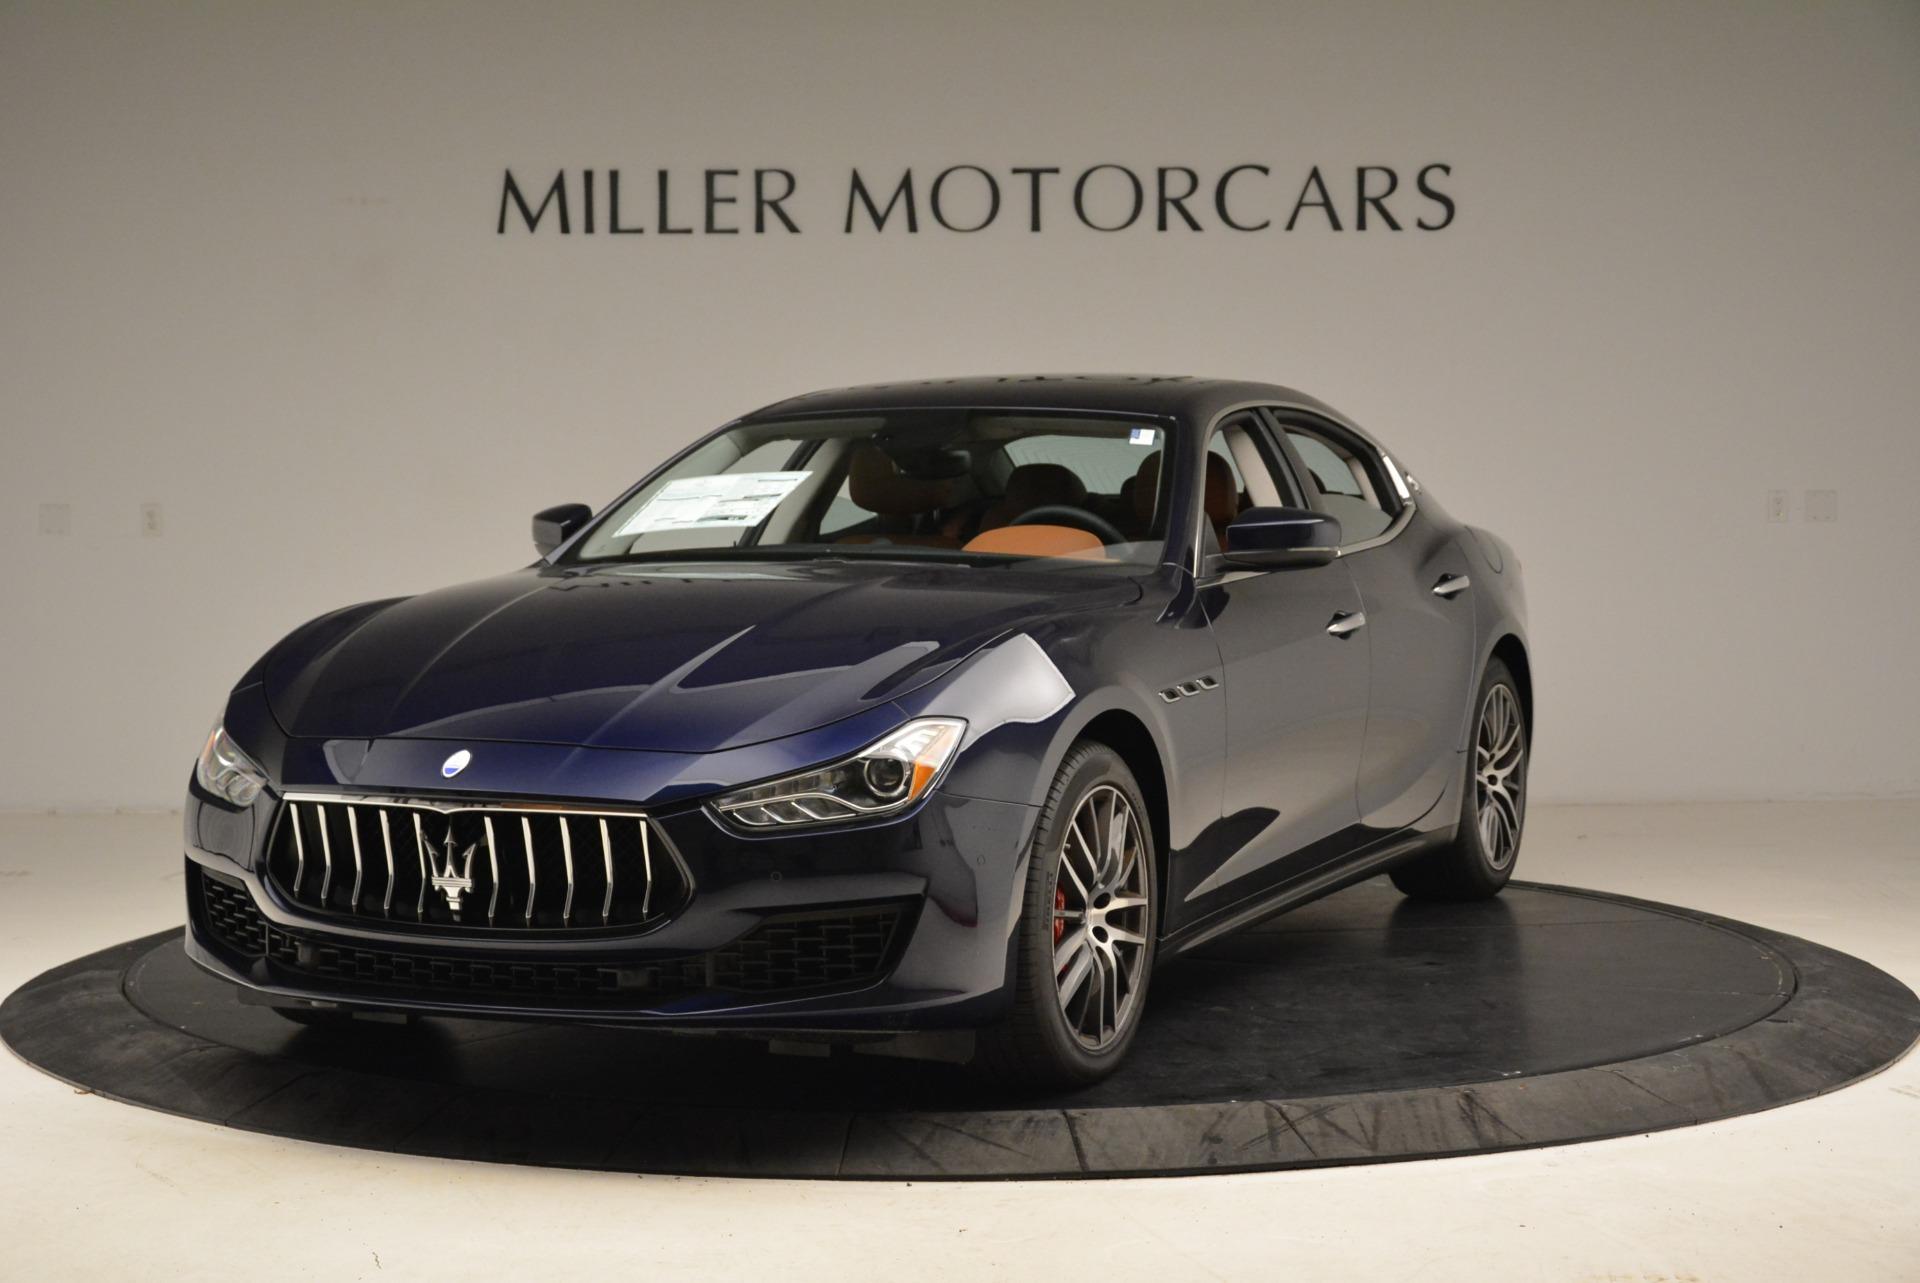 New 2020 Maserati Ghibli S Q4 for sale $87,835 at Rolls-Royce Motor Cars Greenwich in Greenwich CT 06830 1